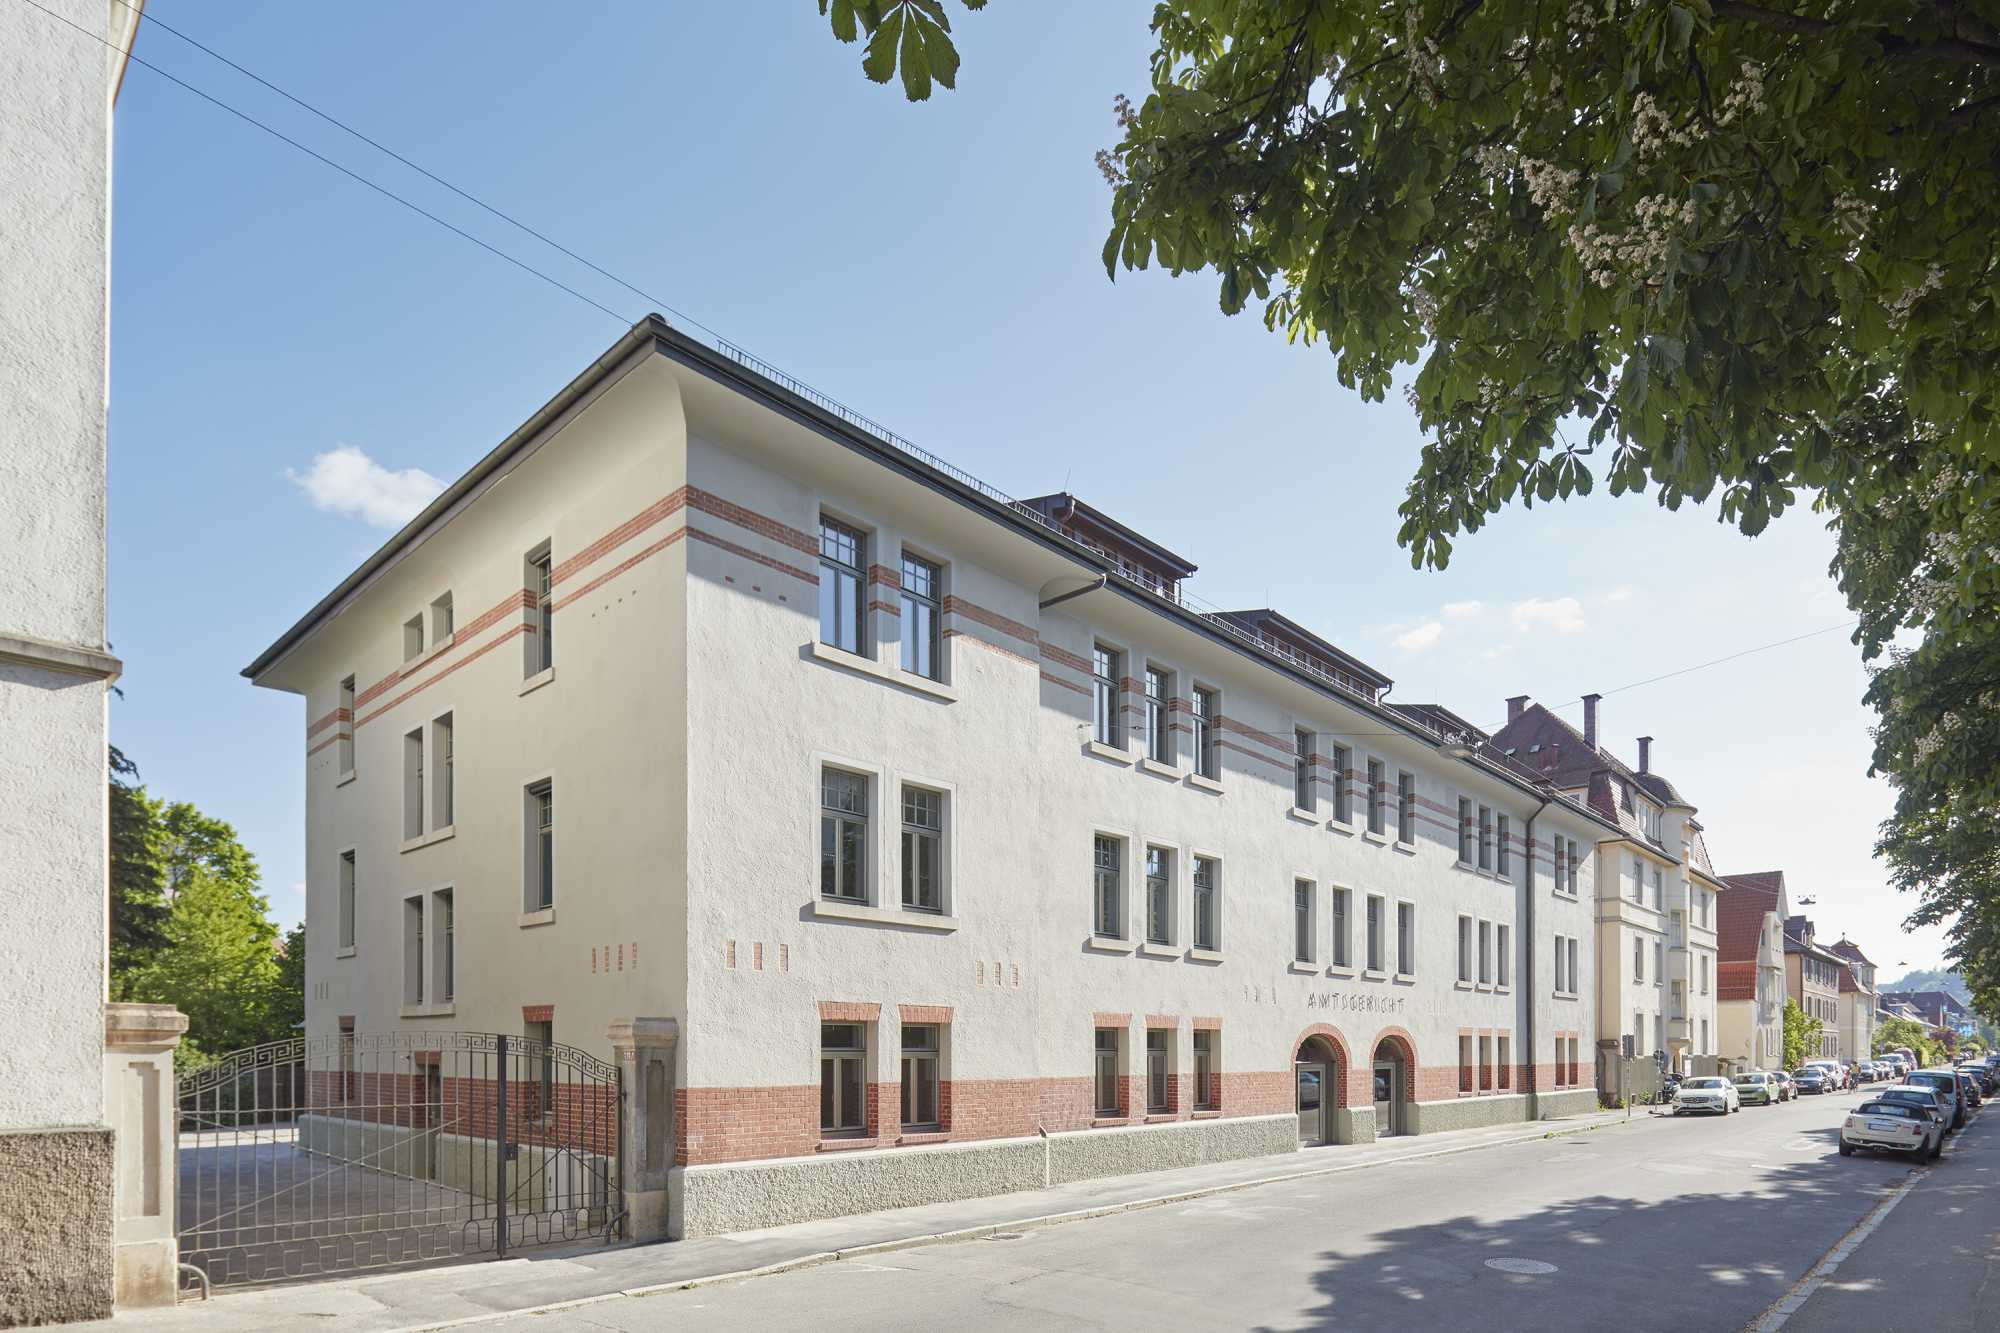 Schlüsselübergabe Amtsgericht  ({project_images:field_row_count})